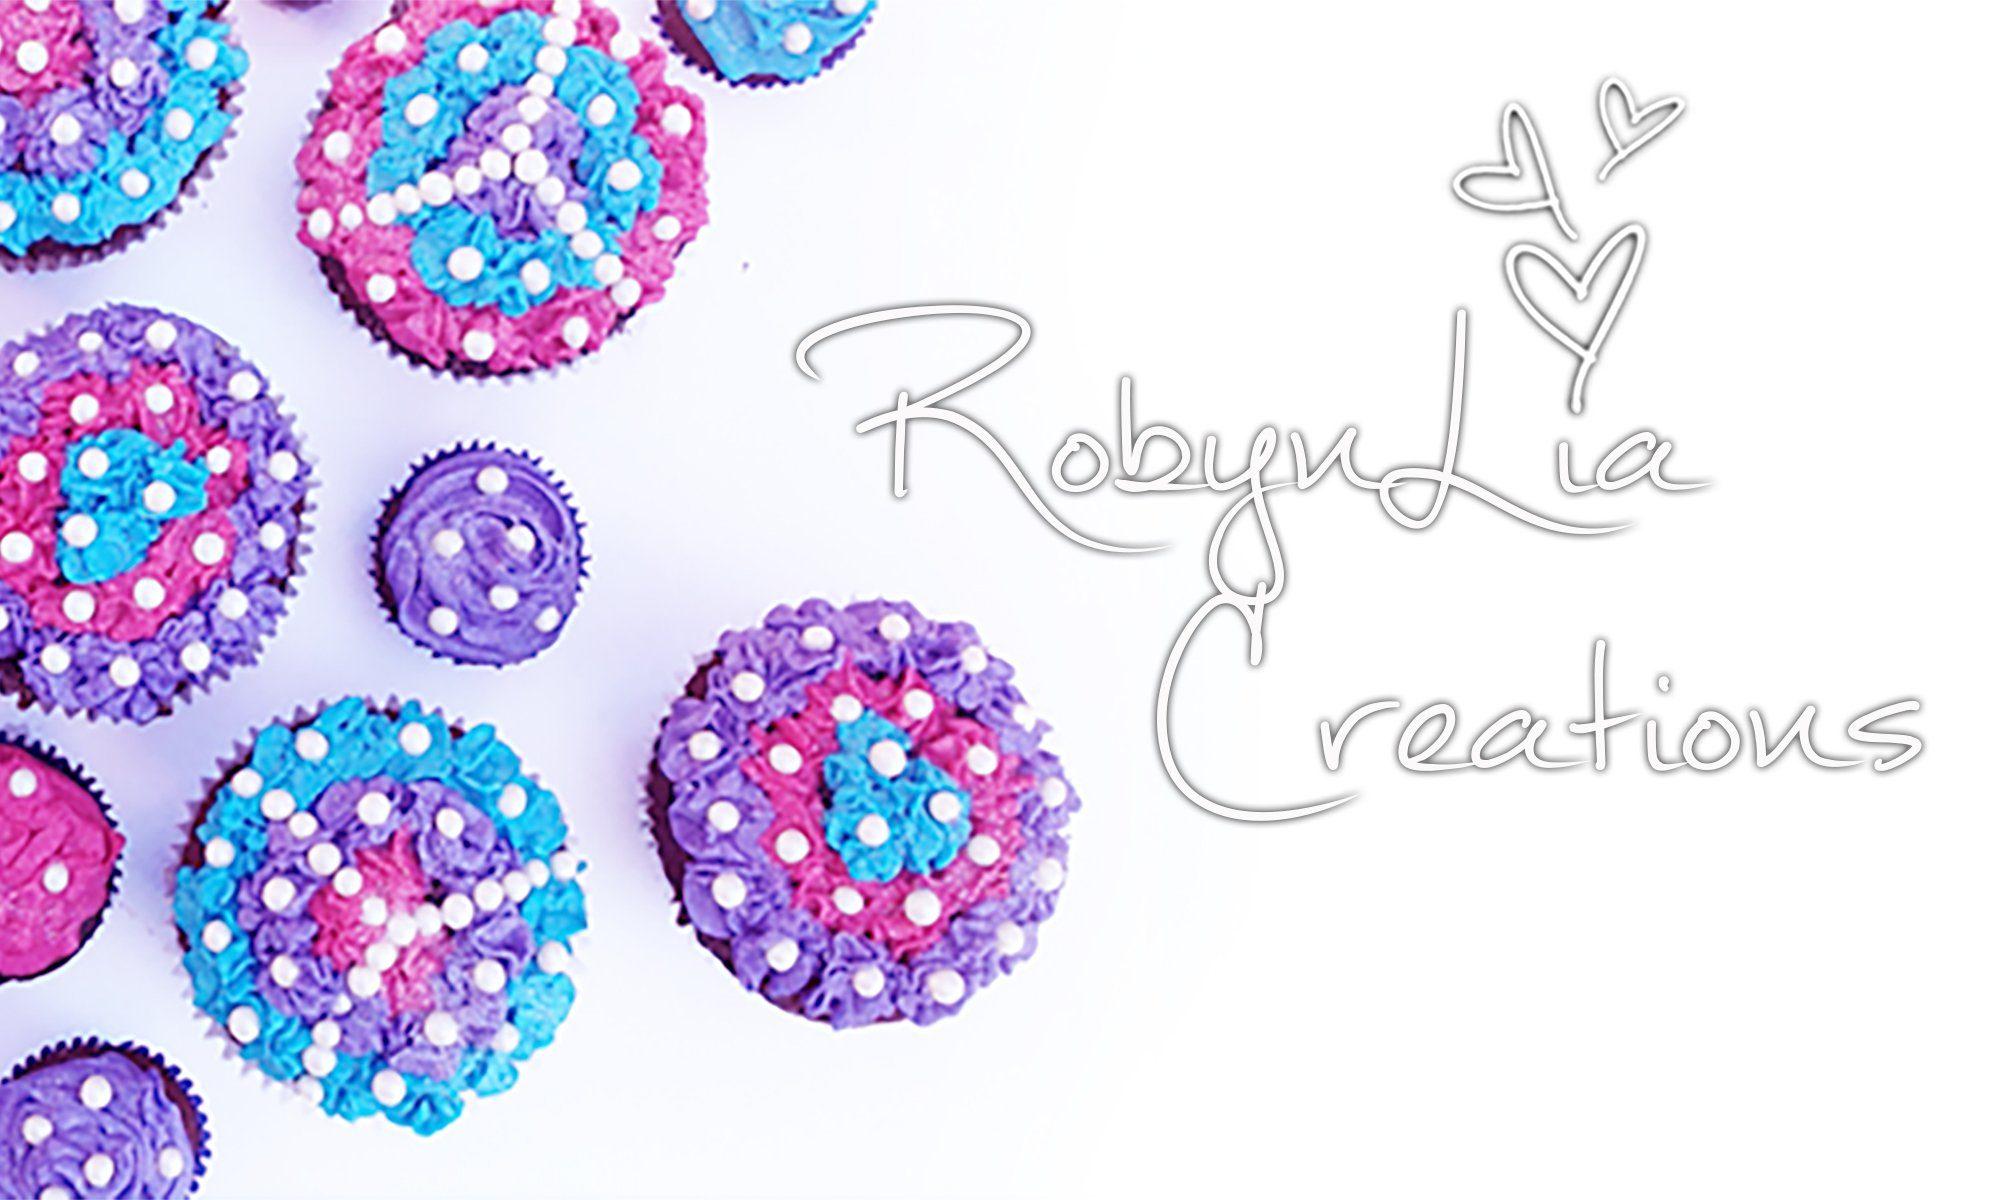 Robynlia Creations